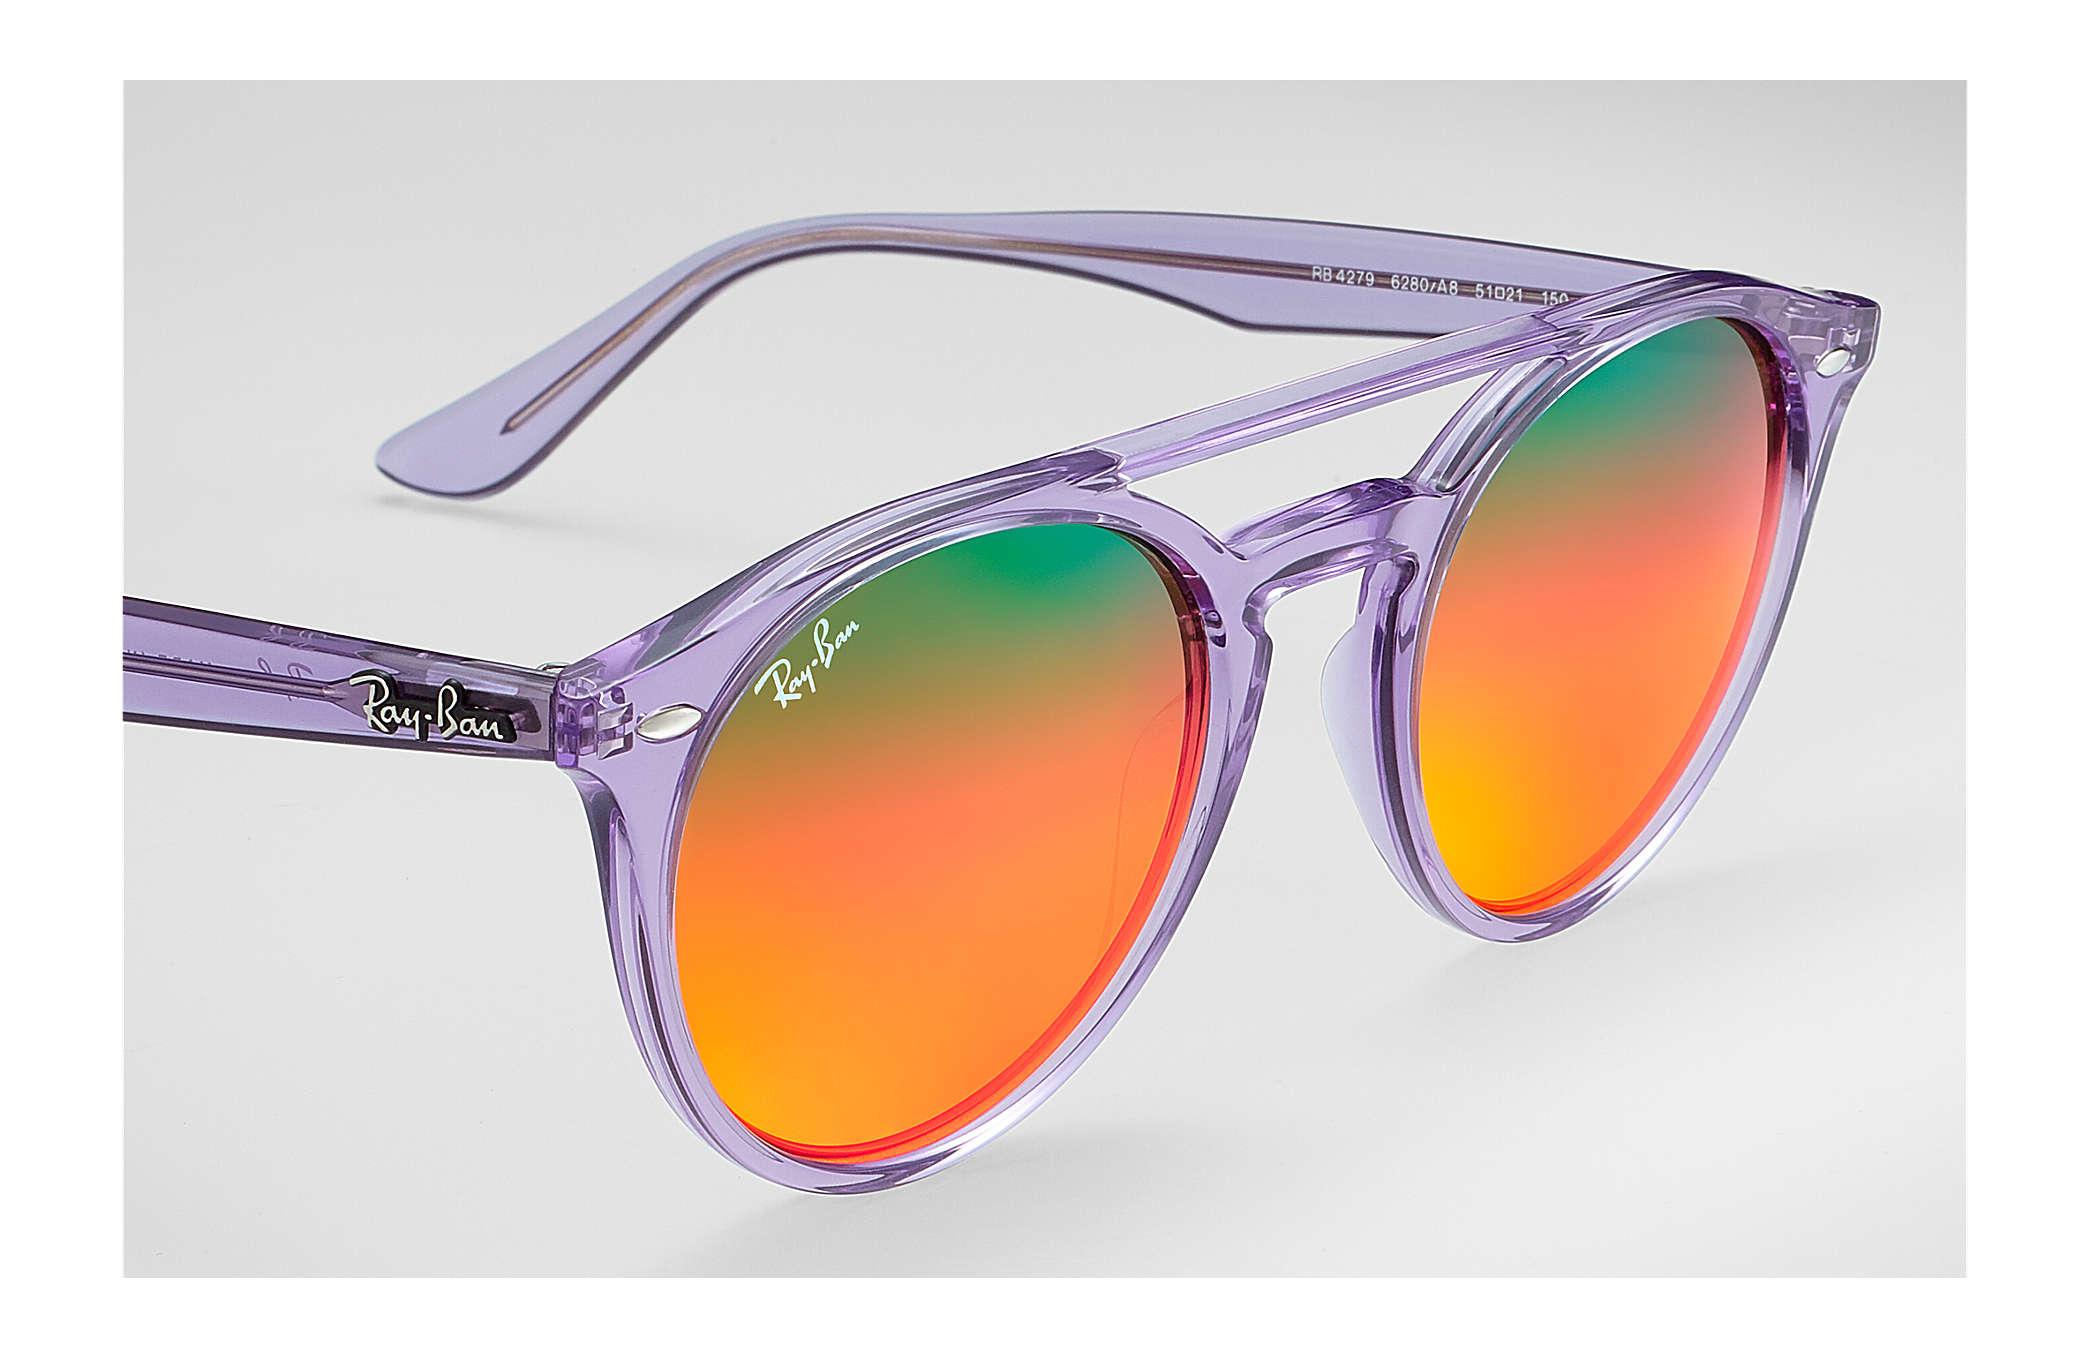 3a3bde8458d Ray-Ban RB4279 Violet - Propionate - Orange Lenses - 0RB42796280A851 ...